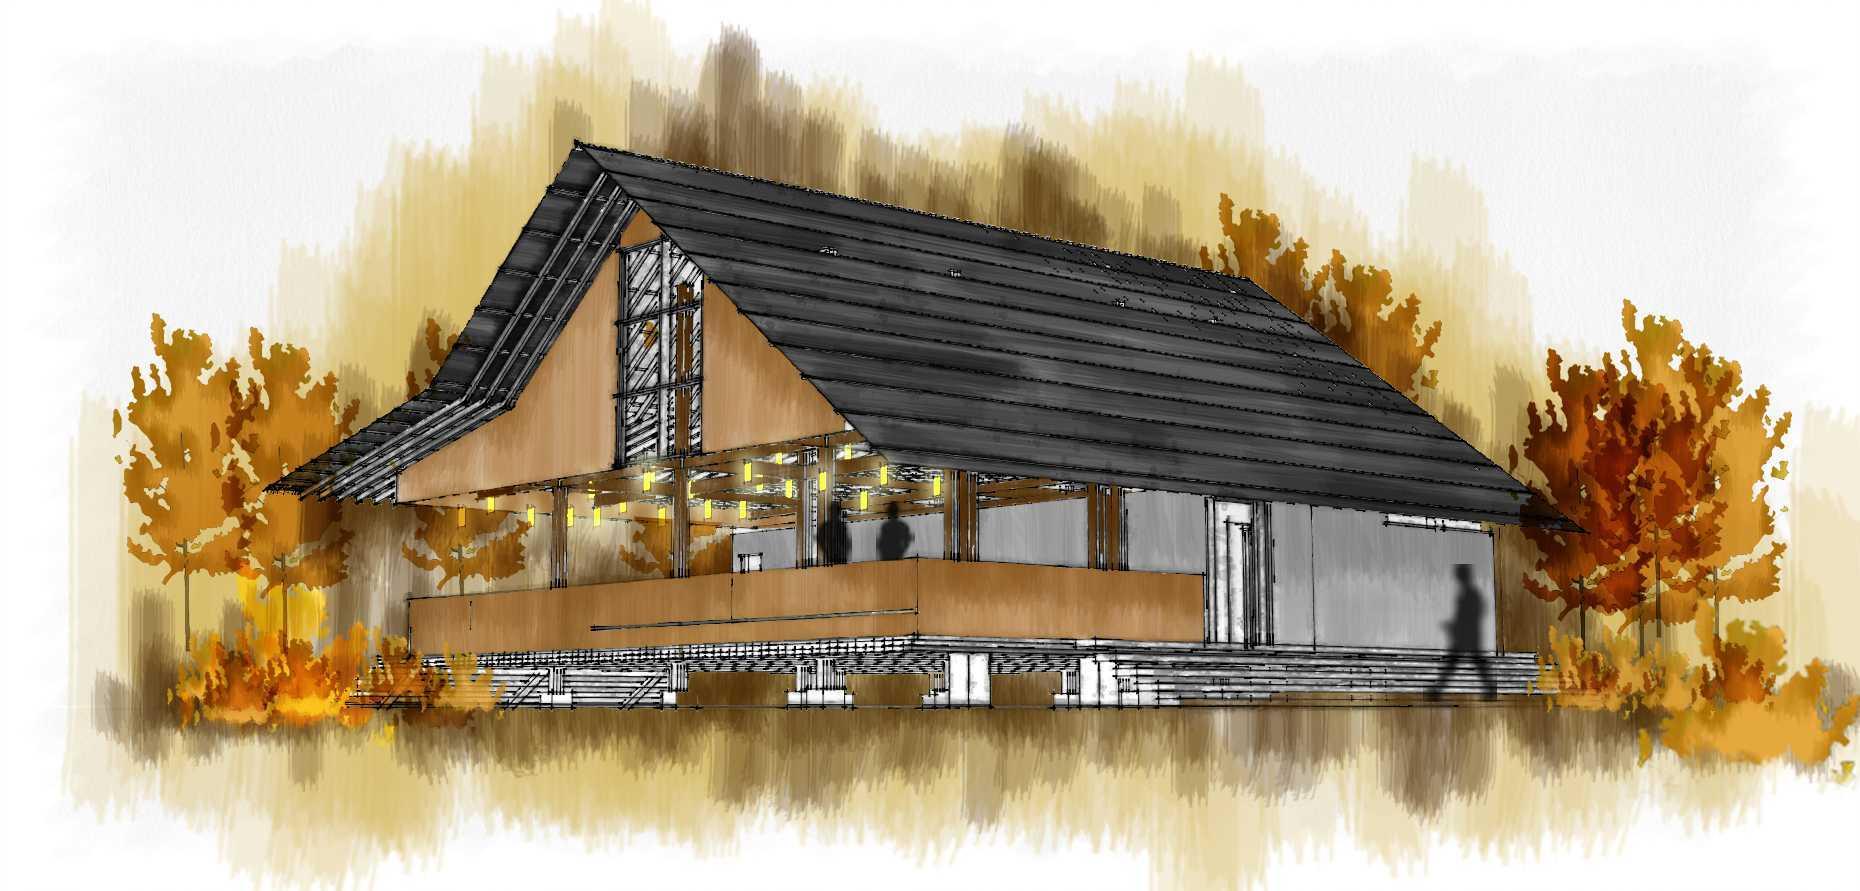 Atelier Baou+ Baduy Resto Pantai Tj. Lesung, Banten, Indonesia Pantai Tj. Lesung, Banten, Indonesia Baduy Resto Traditional  52460